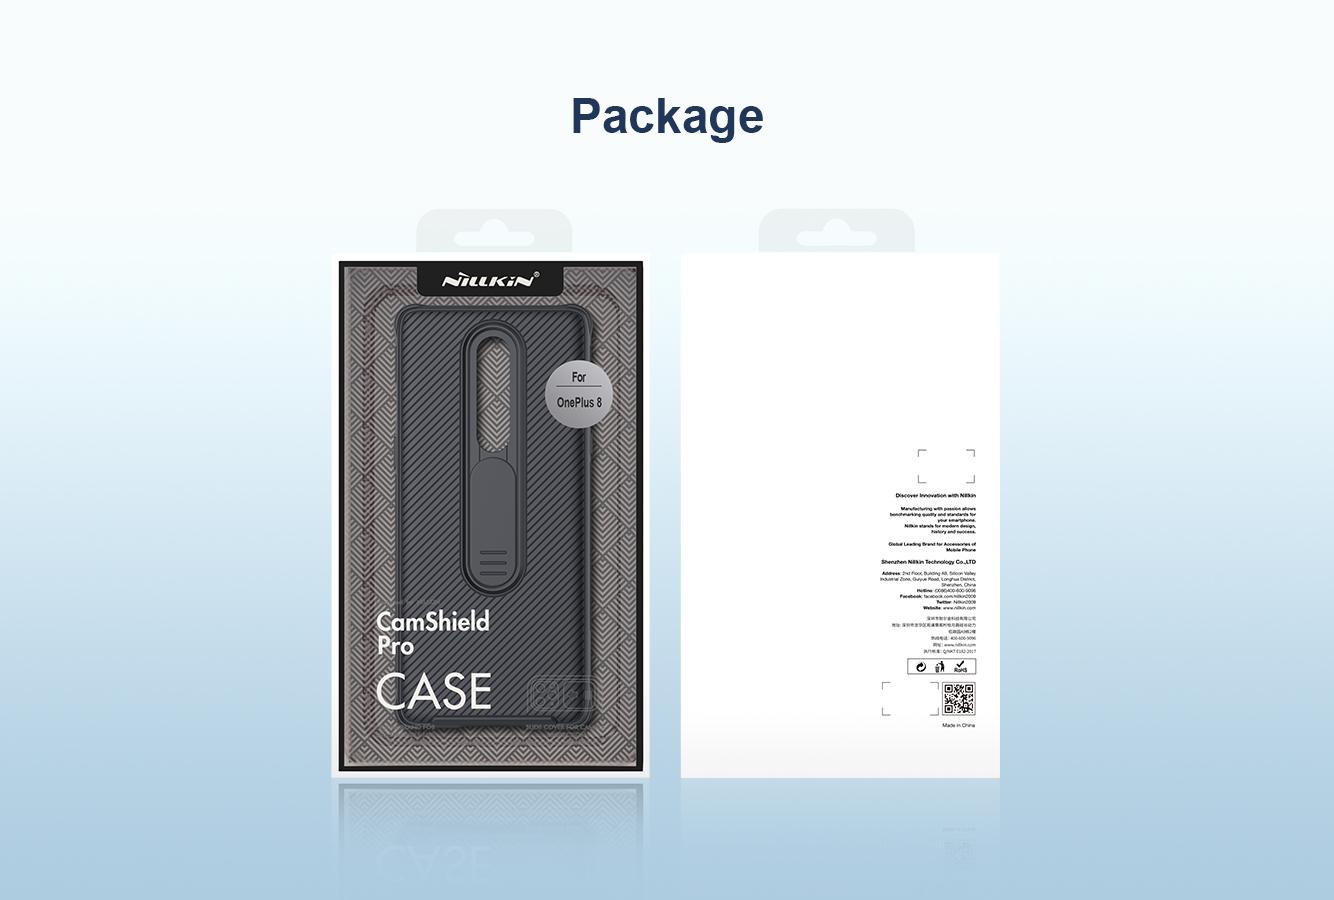 OnePlus_8_CamShield_Pro_Case-12.jpg